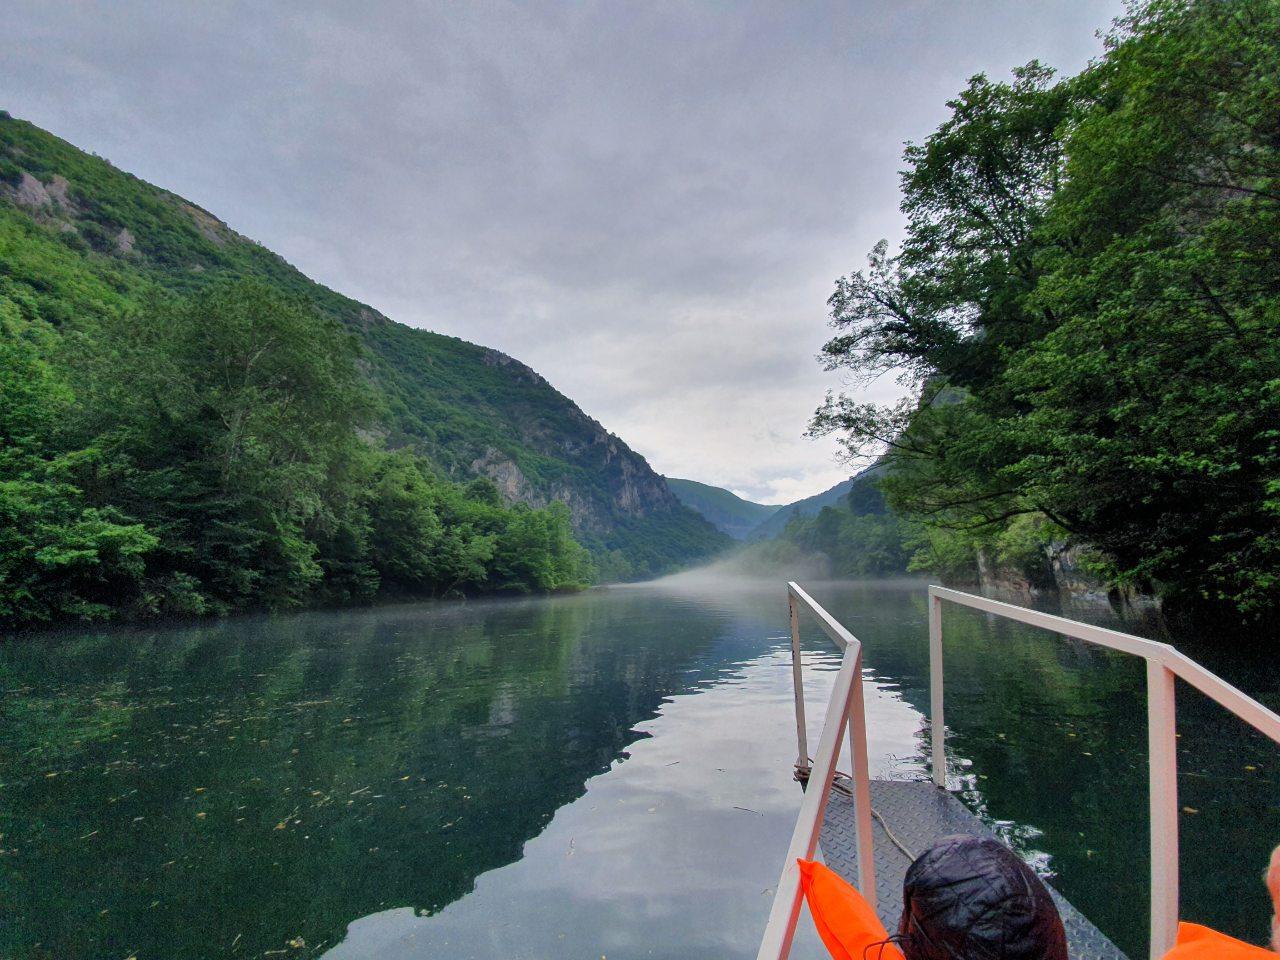 Treska river with fog in Matka canyon w